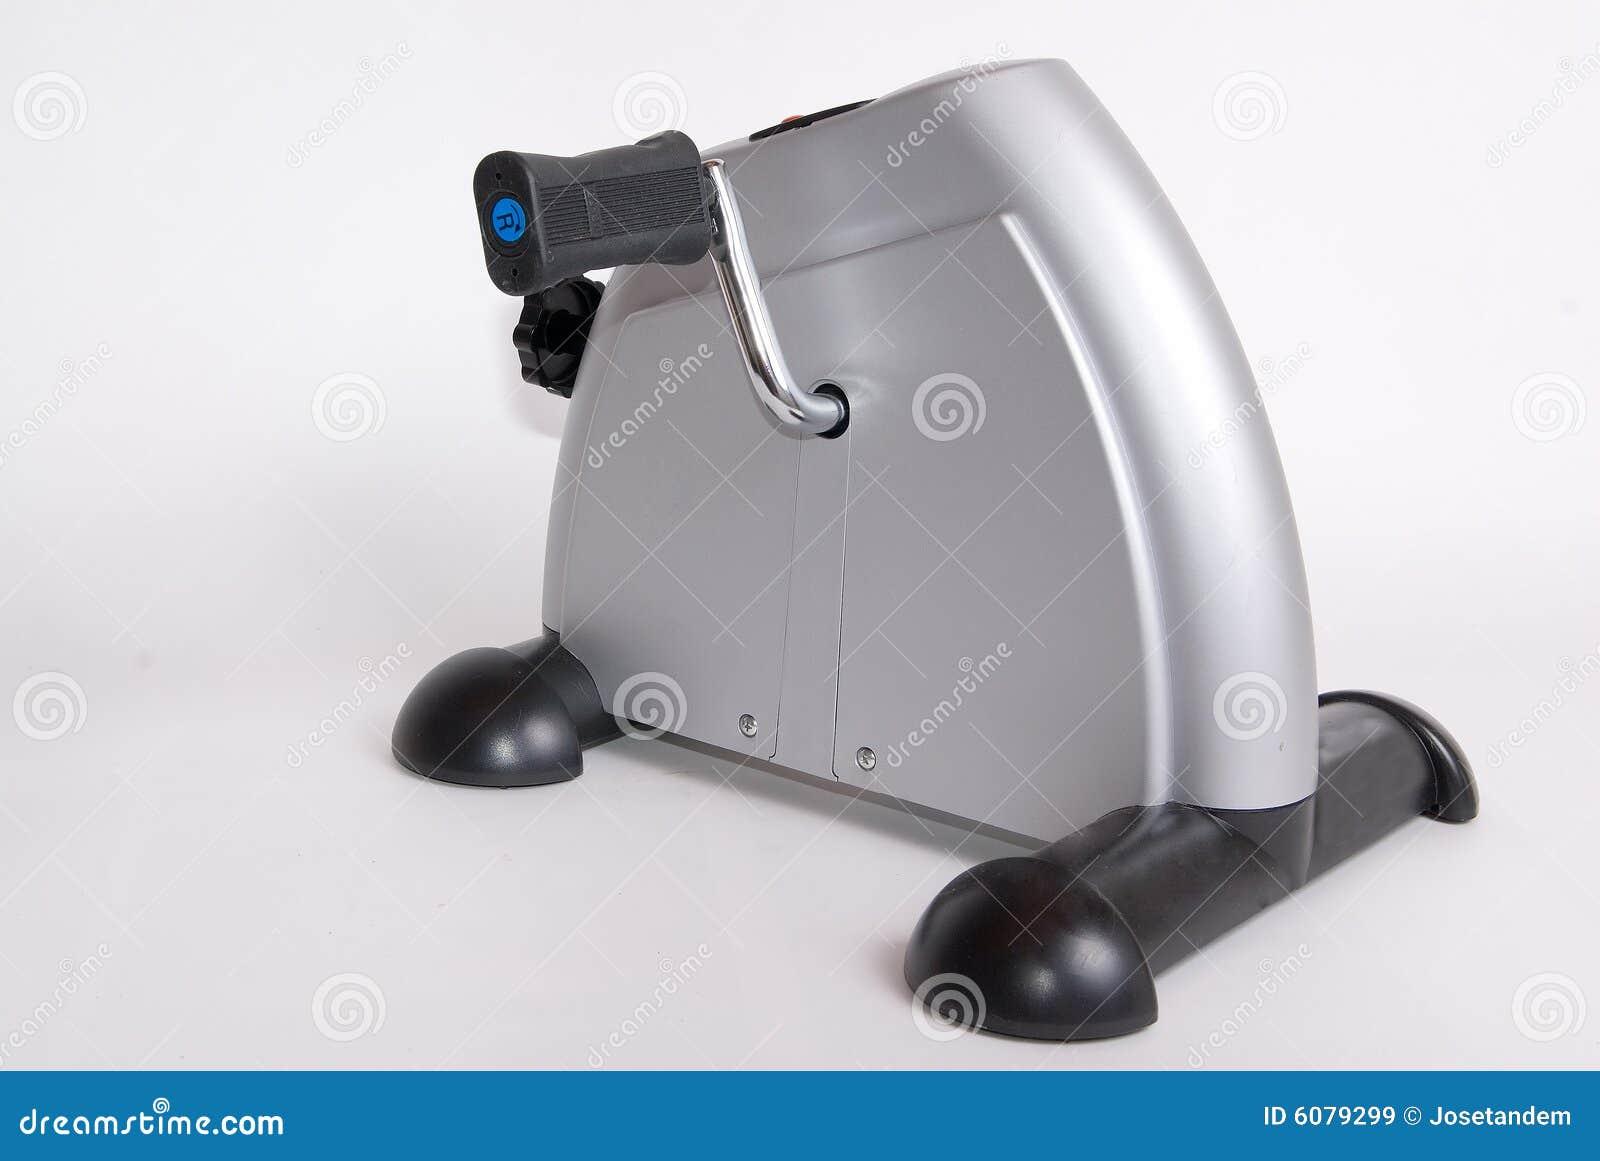 pedal machine